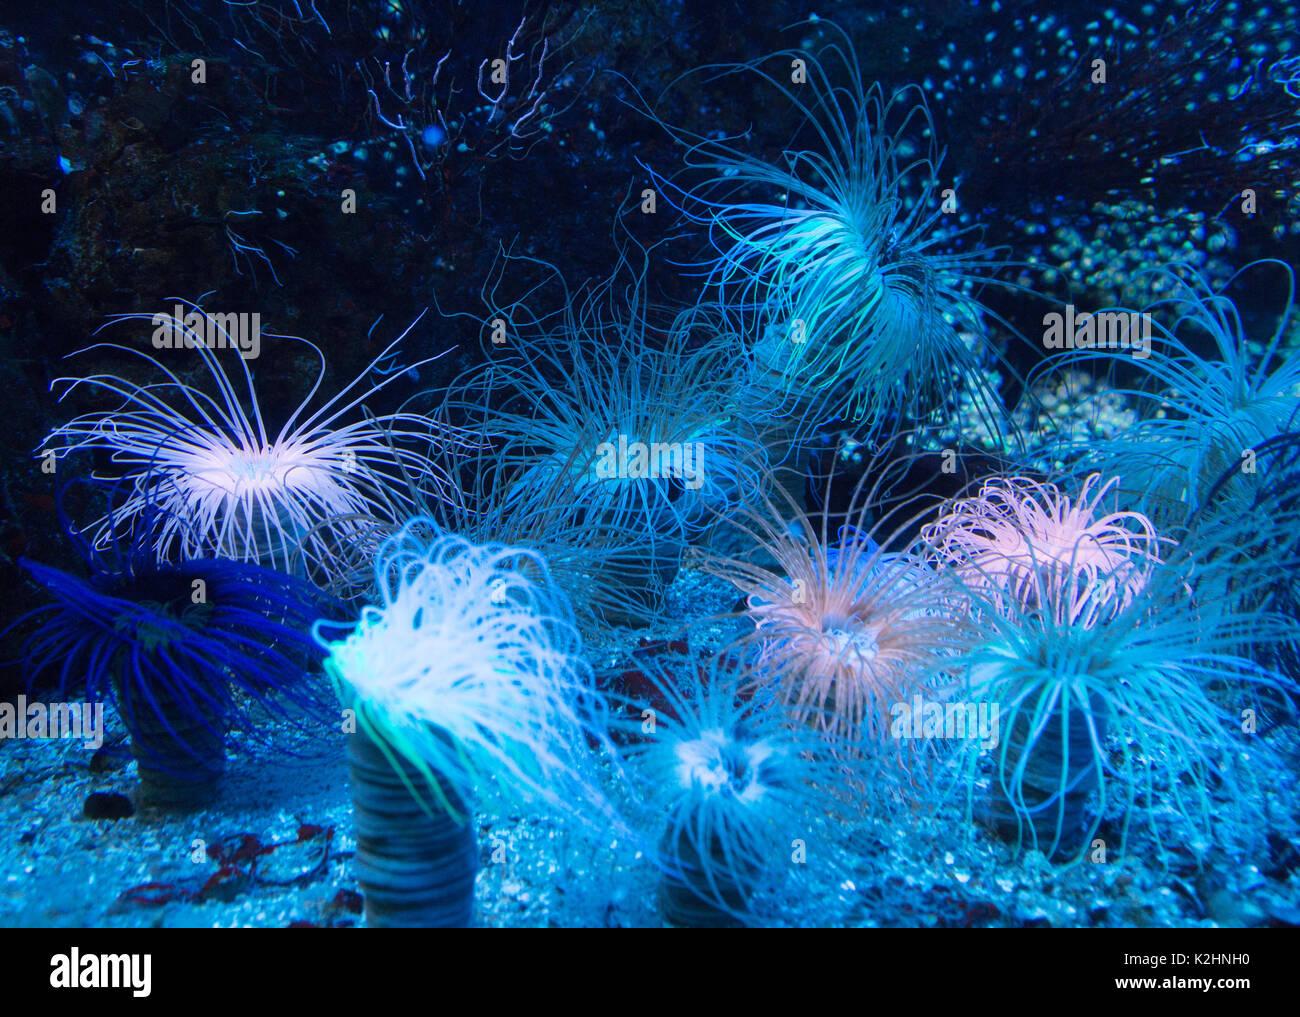 sea-anemone-a-selection-of-sea-anemones-